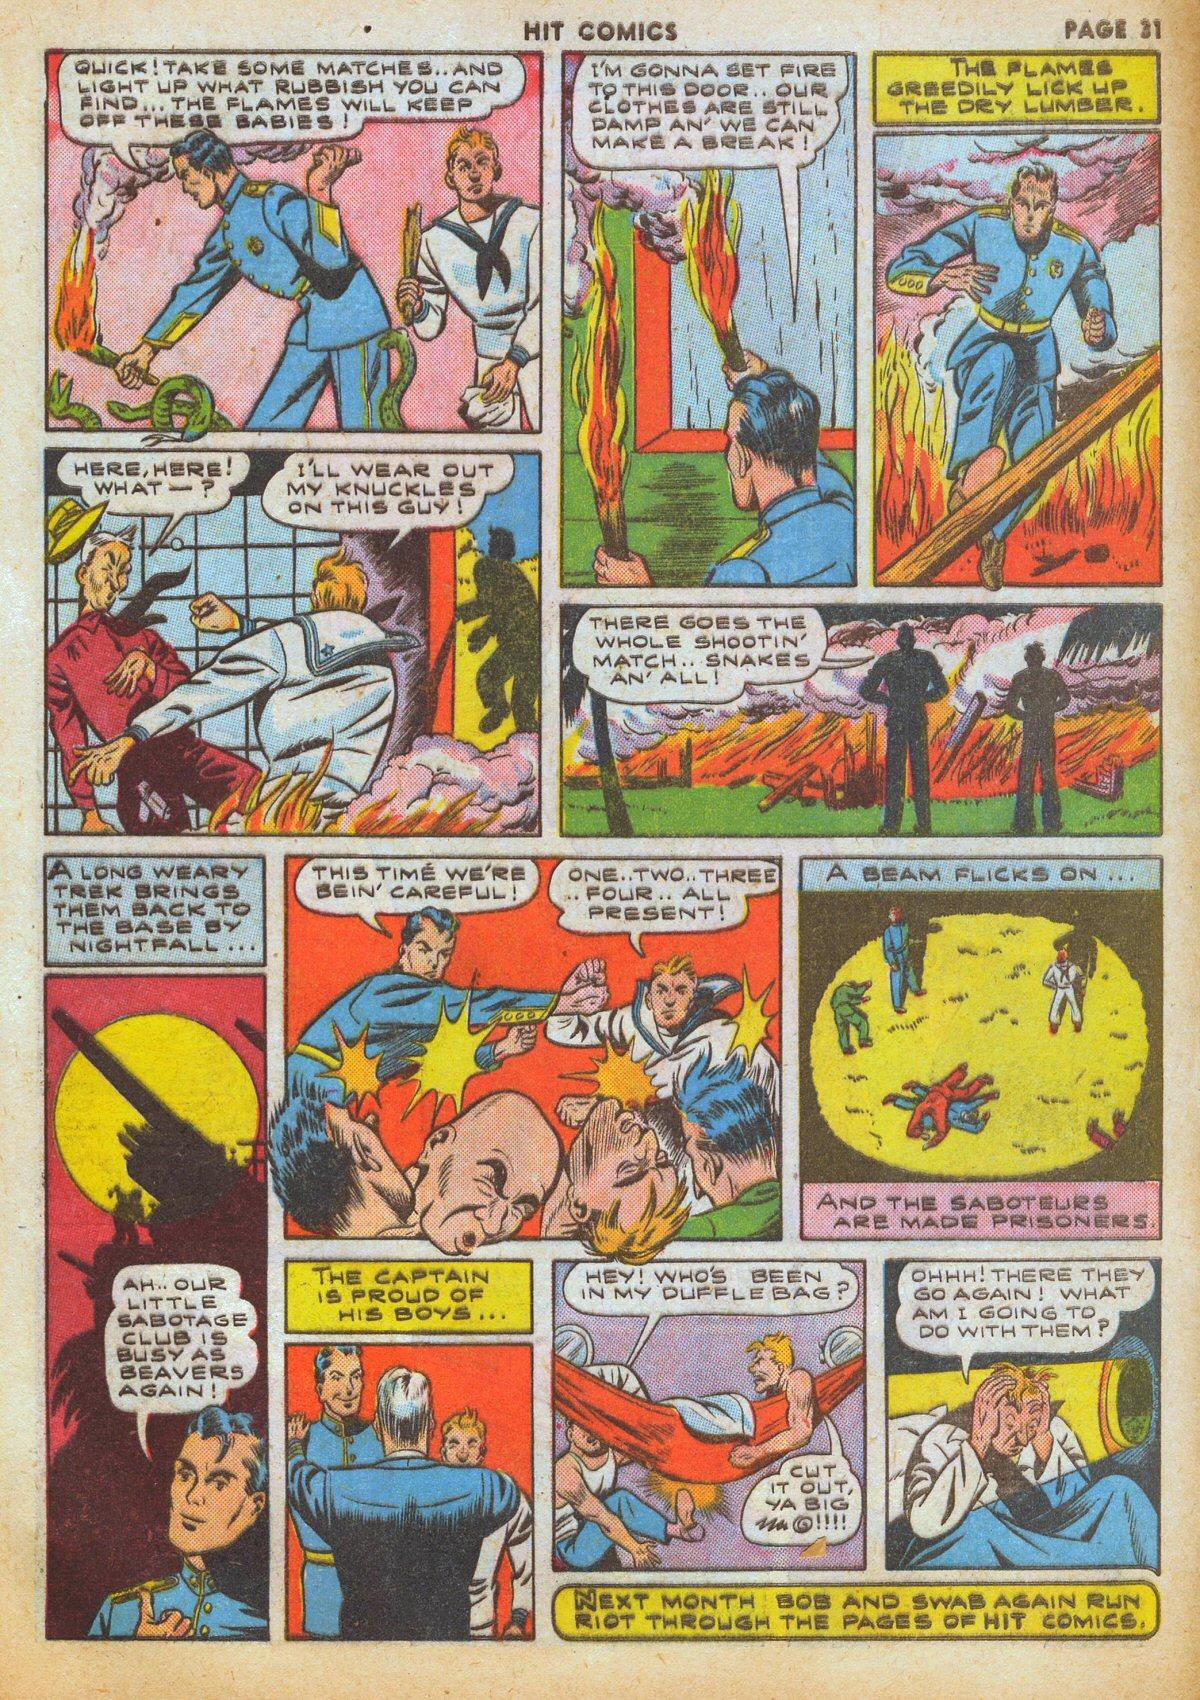 Read online Hit Comics comic -  Issue #12 - 33